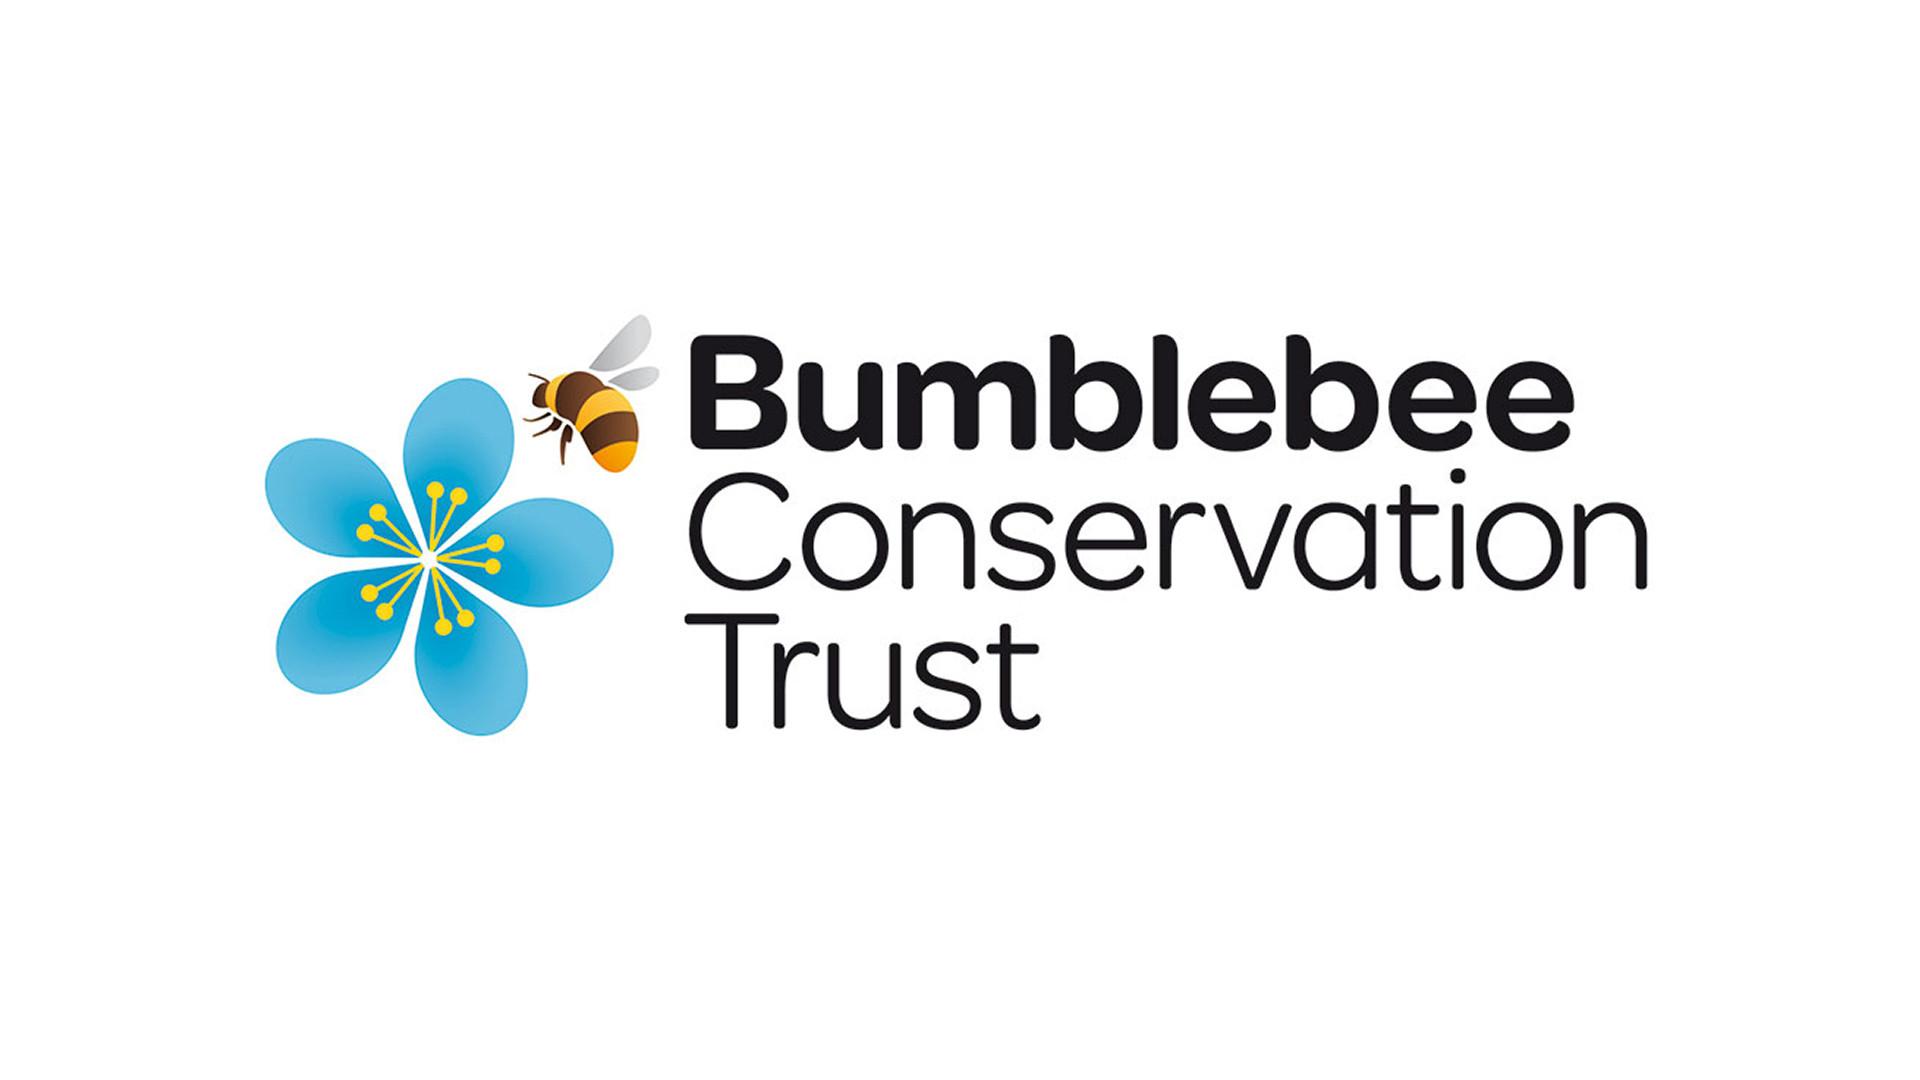 Bumblebee conservation trust.jpg